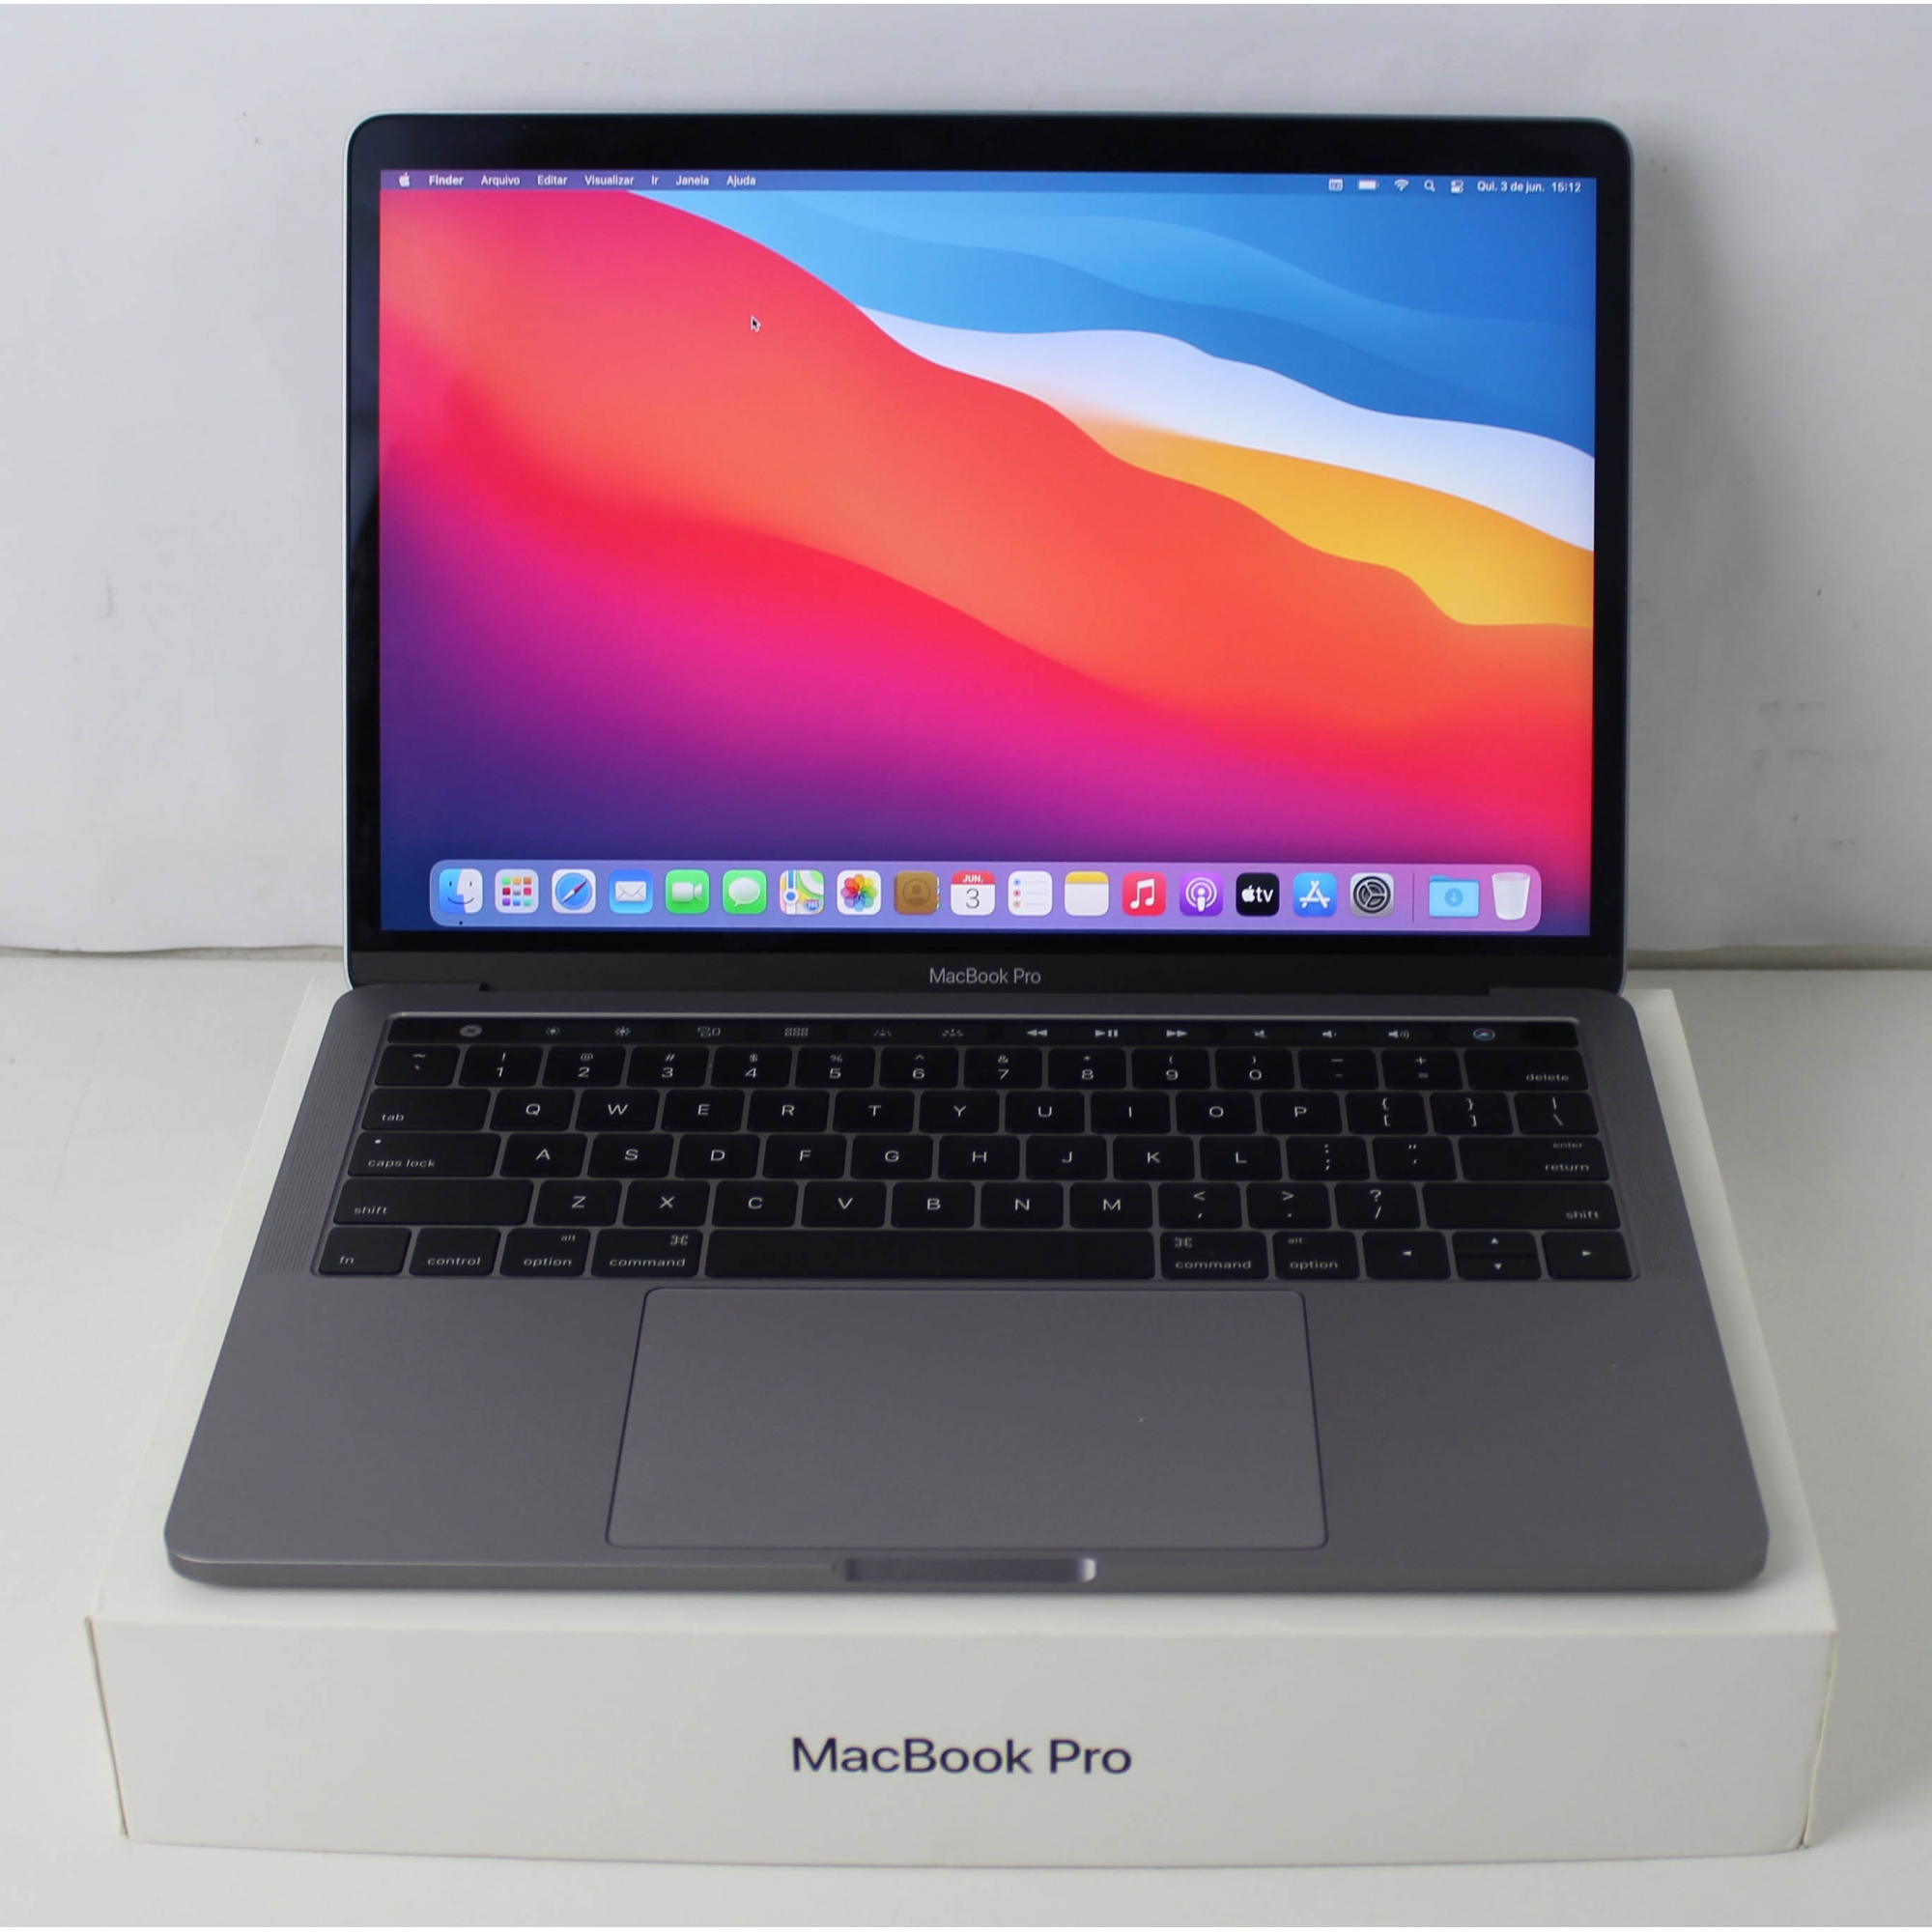 "MACBOOK PRO MNQF2LL/A 13.3"" INTEL CORE I5 2.9GHZ 8GB SSD-512GB + TOUCH BAR"